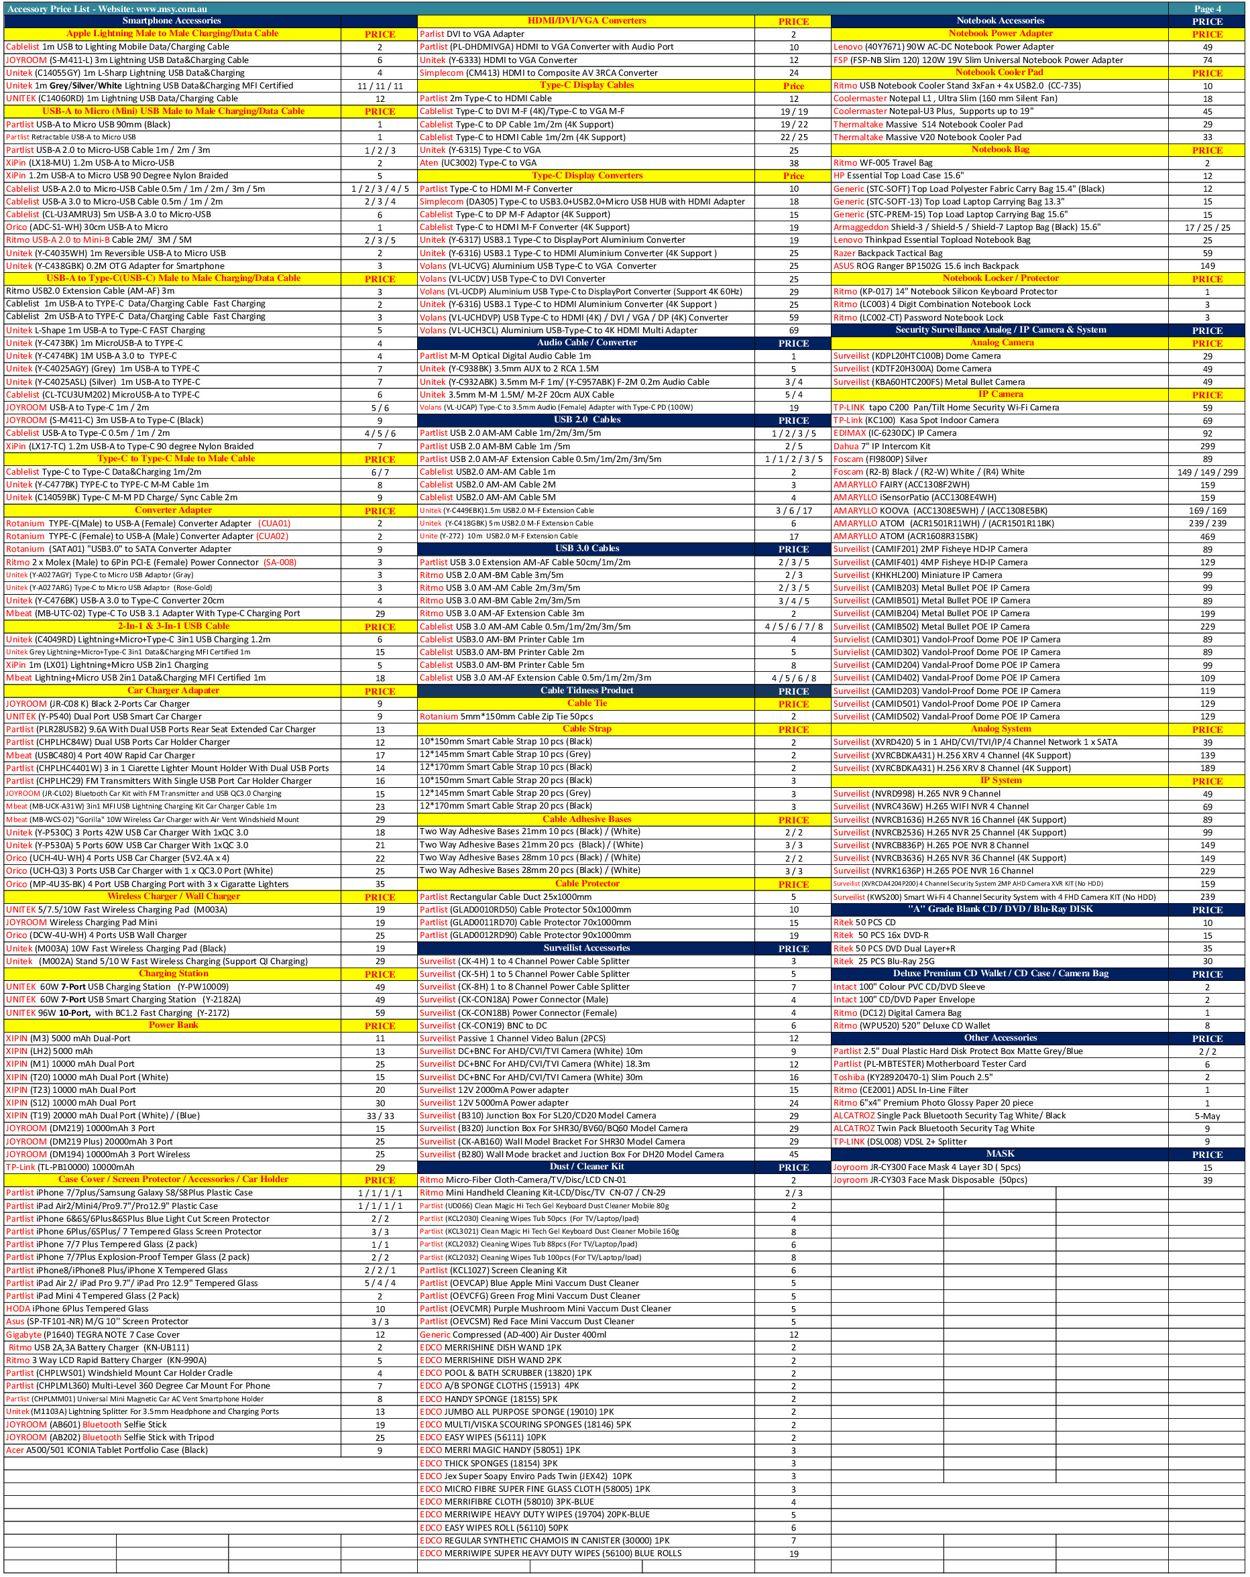 MSY Technology Catalogue - 02/12-02/12/2020 (Page 4)